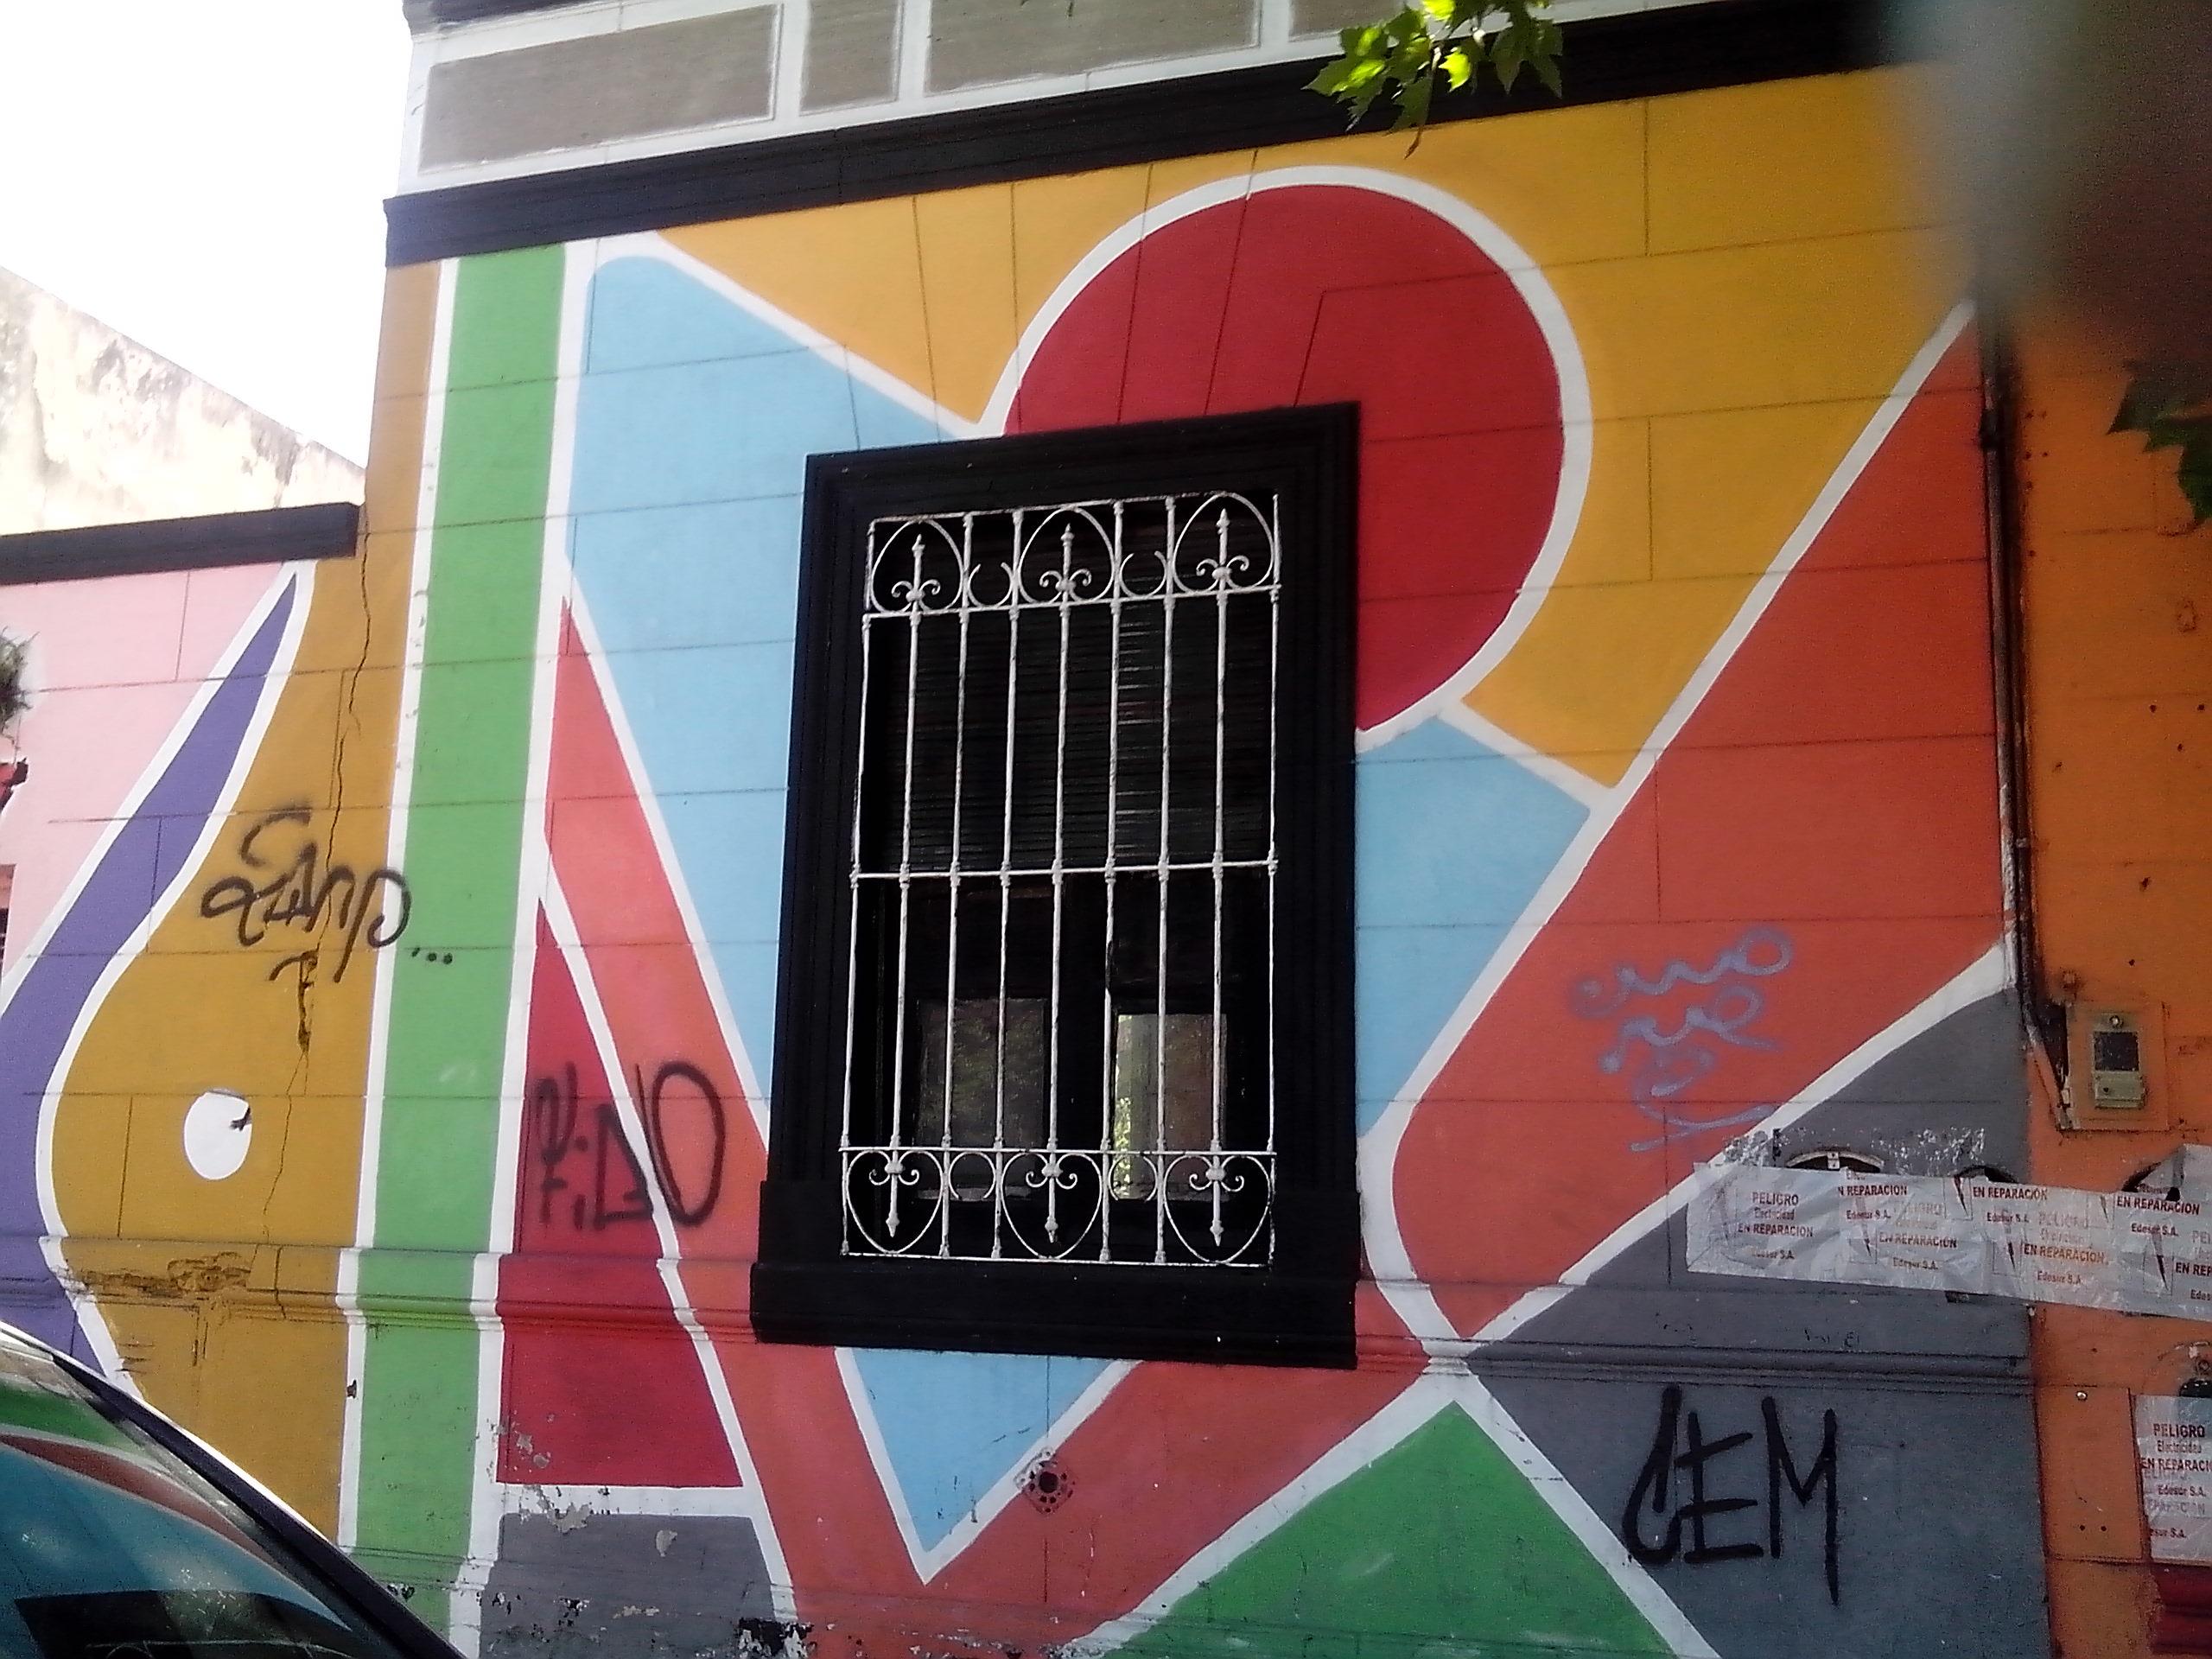 Mural en calle Belgrano esquina Gral Paz - Mural en Av. Belgrano y Gral. Paz